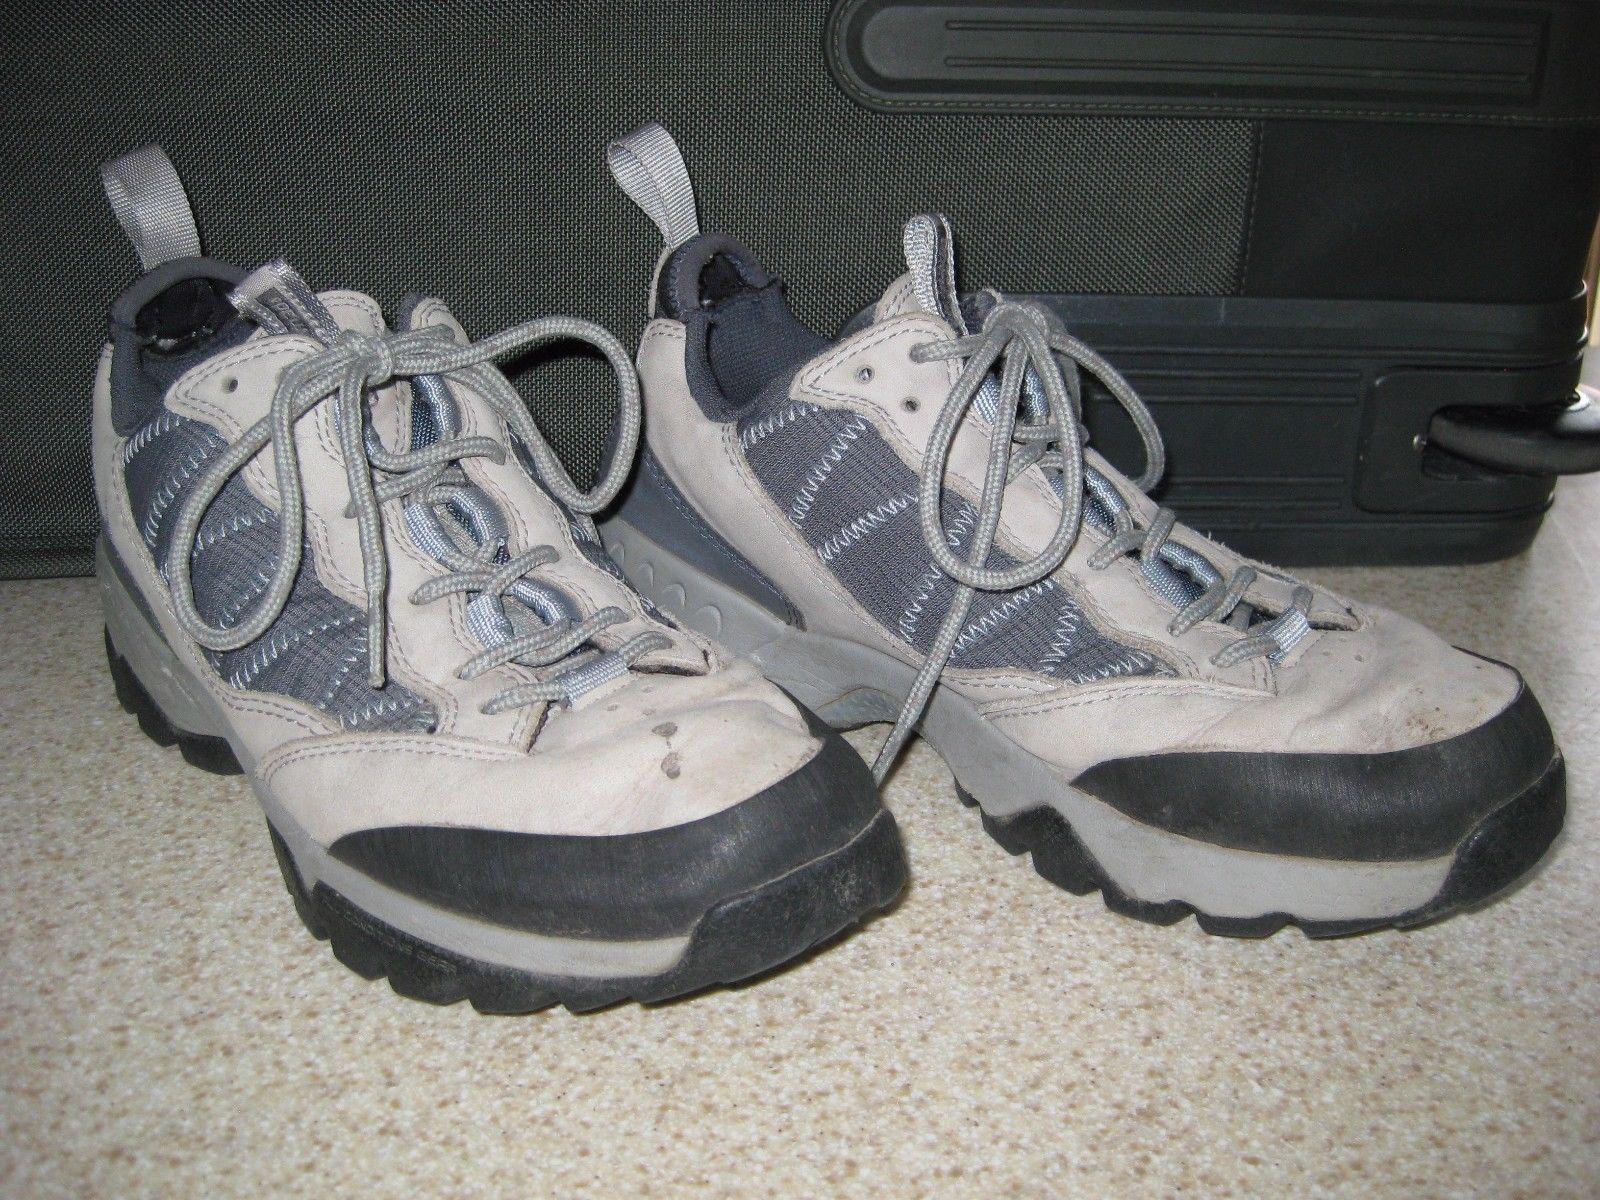 premium selection e1037 030f2 Nike ACG hiking shoes, women size 8.5 and 50 similar items. 57